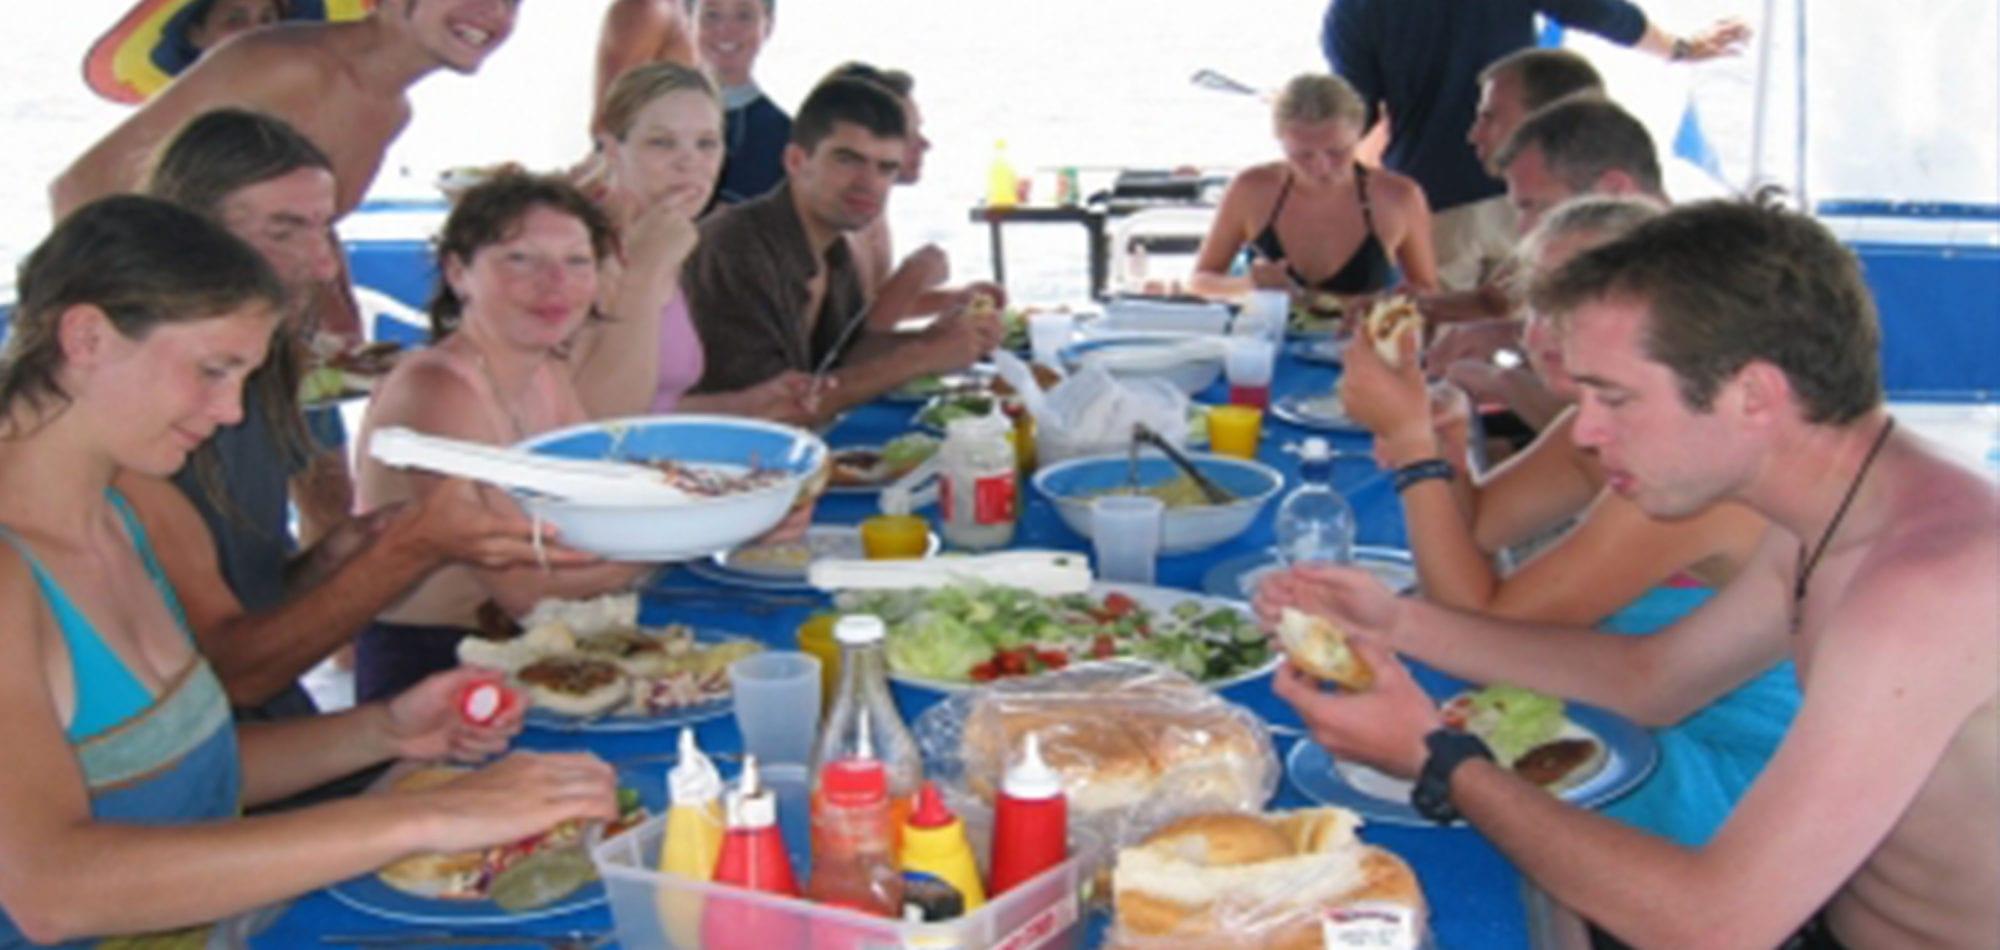 Sea Esta scuba diving trip - Top Side Lunch